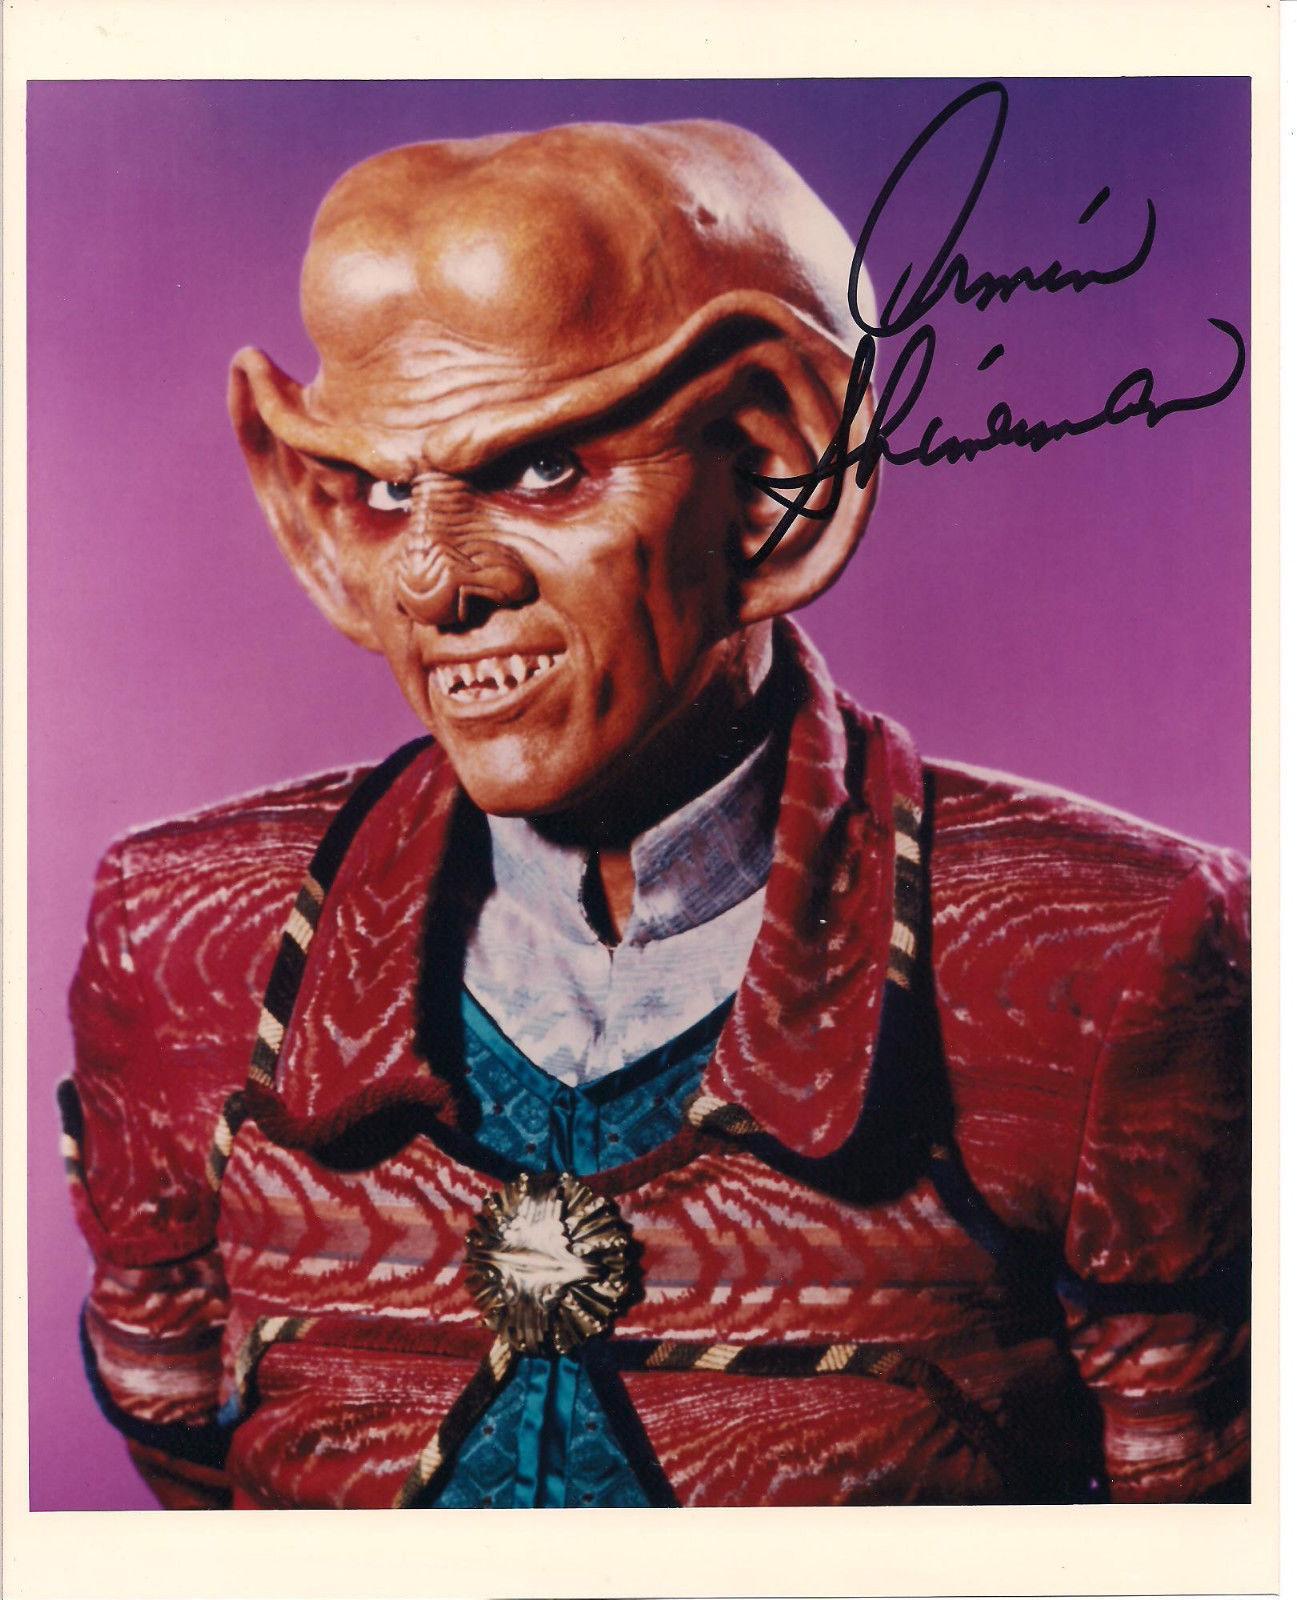 "Armin Shimernan ""quark"" Star Trek Autographed Signed 8x10 Photo W/coa"